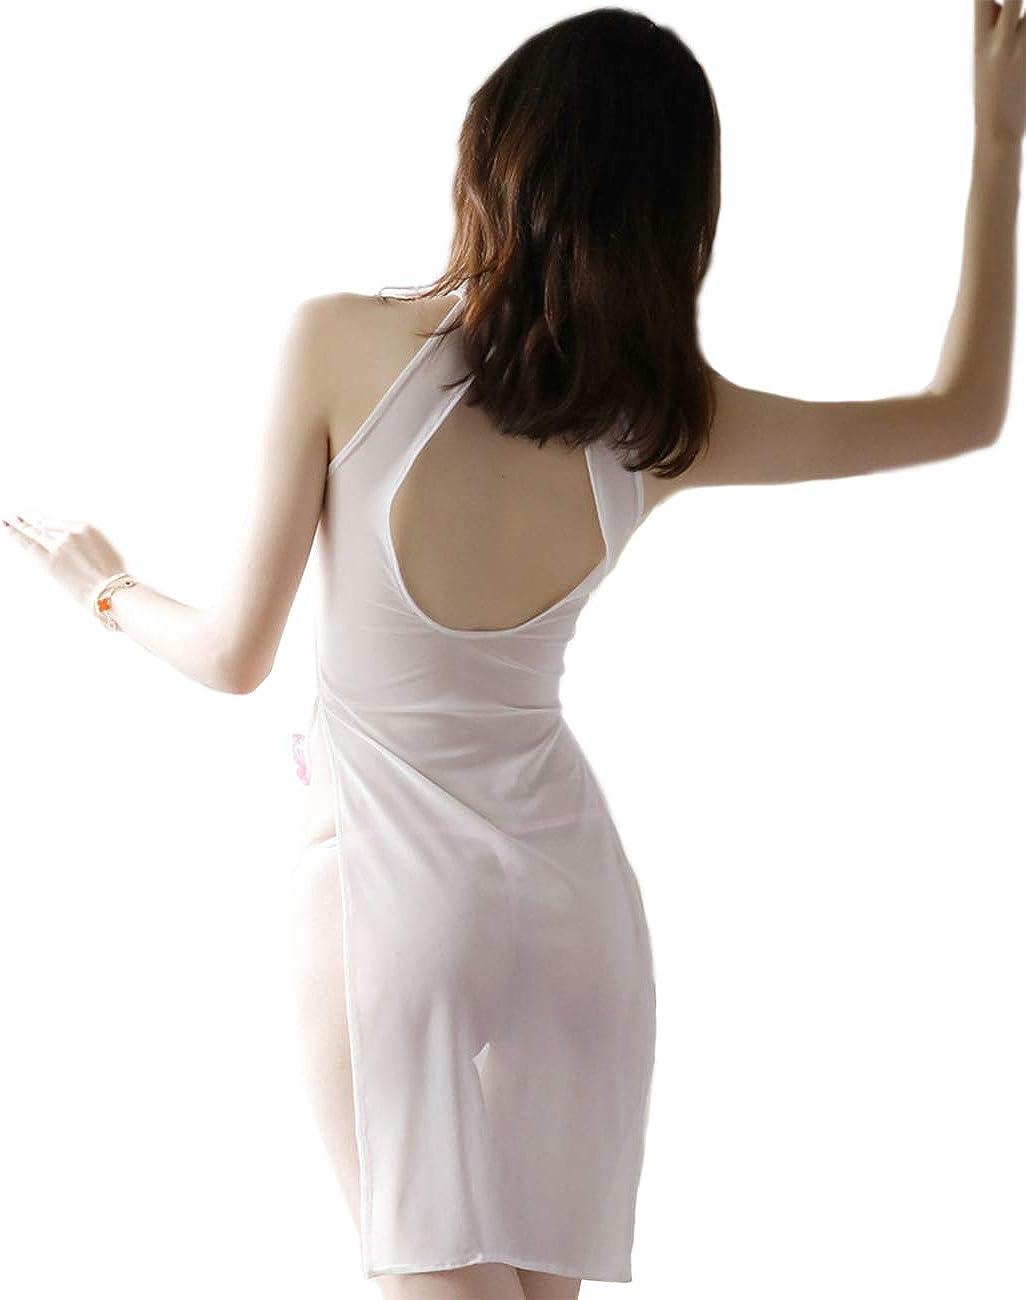 Kadila Womens Babydoll Cosplay Uniform Cheongsam Dessous Halfter r/ückenfreie Nachthemd Nachtw/äsche Floral Kleid